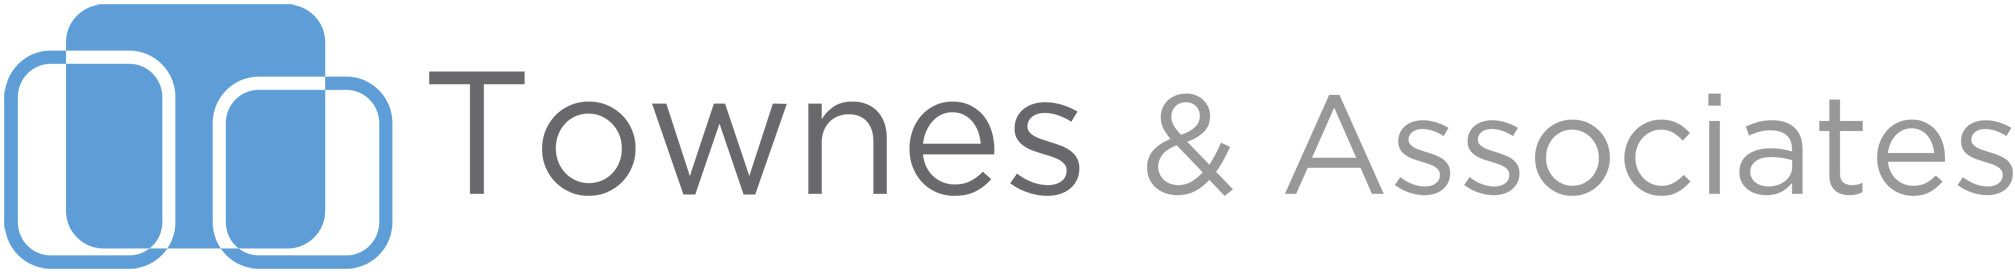 Townes & Associates